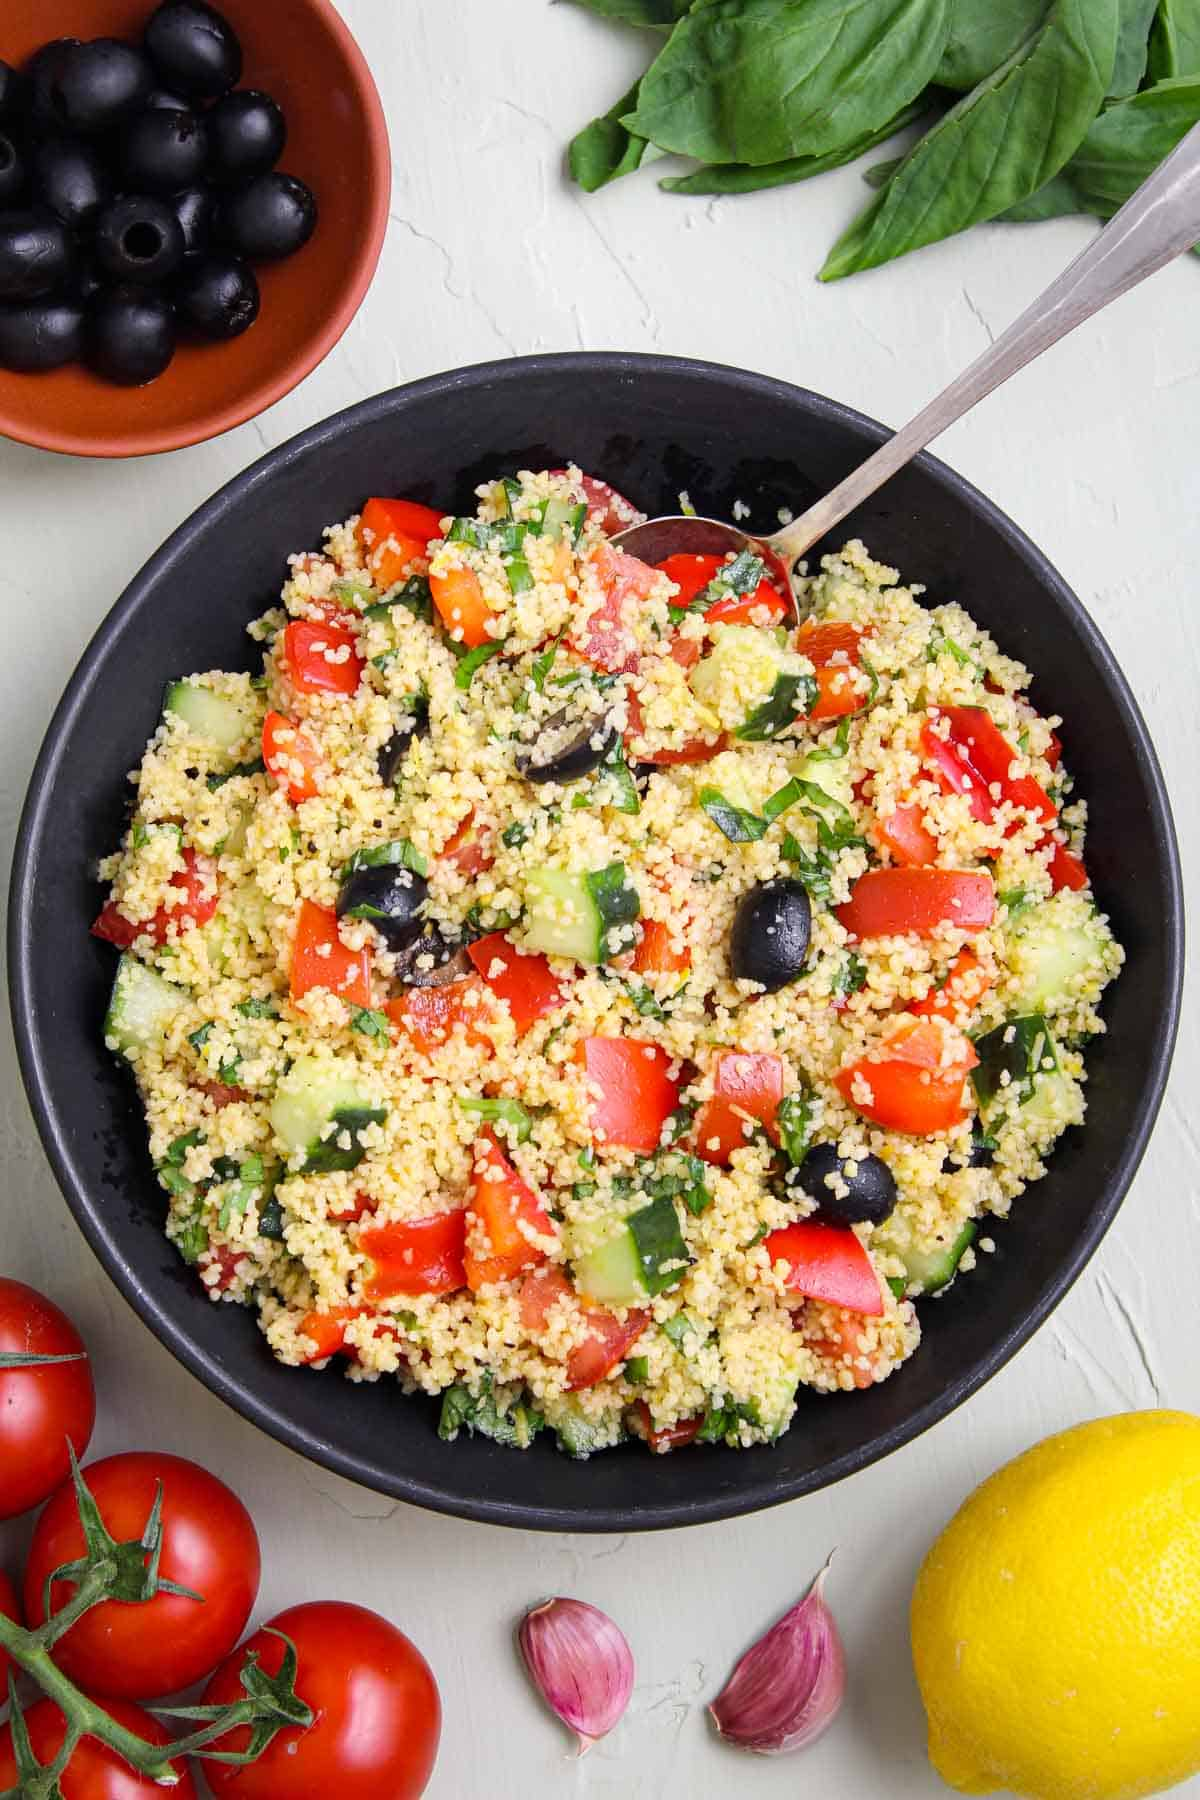 Vegan Couscous Salad Overhead with Lemon, Tomatoes, Olives, Basil, Garlic